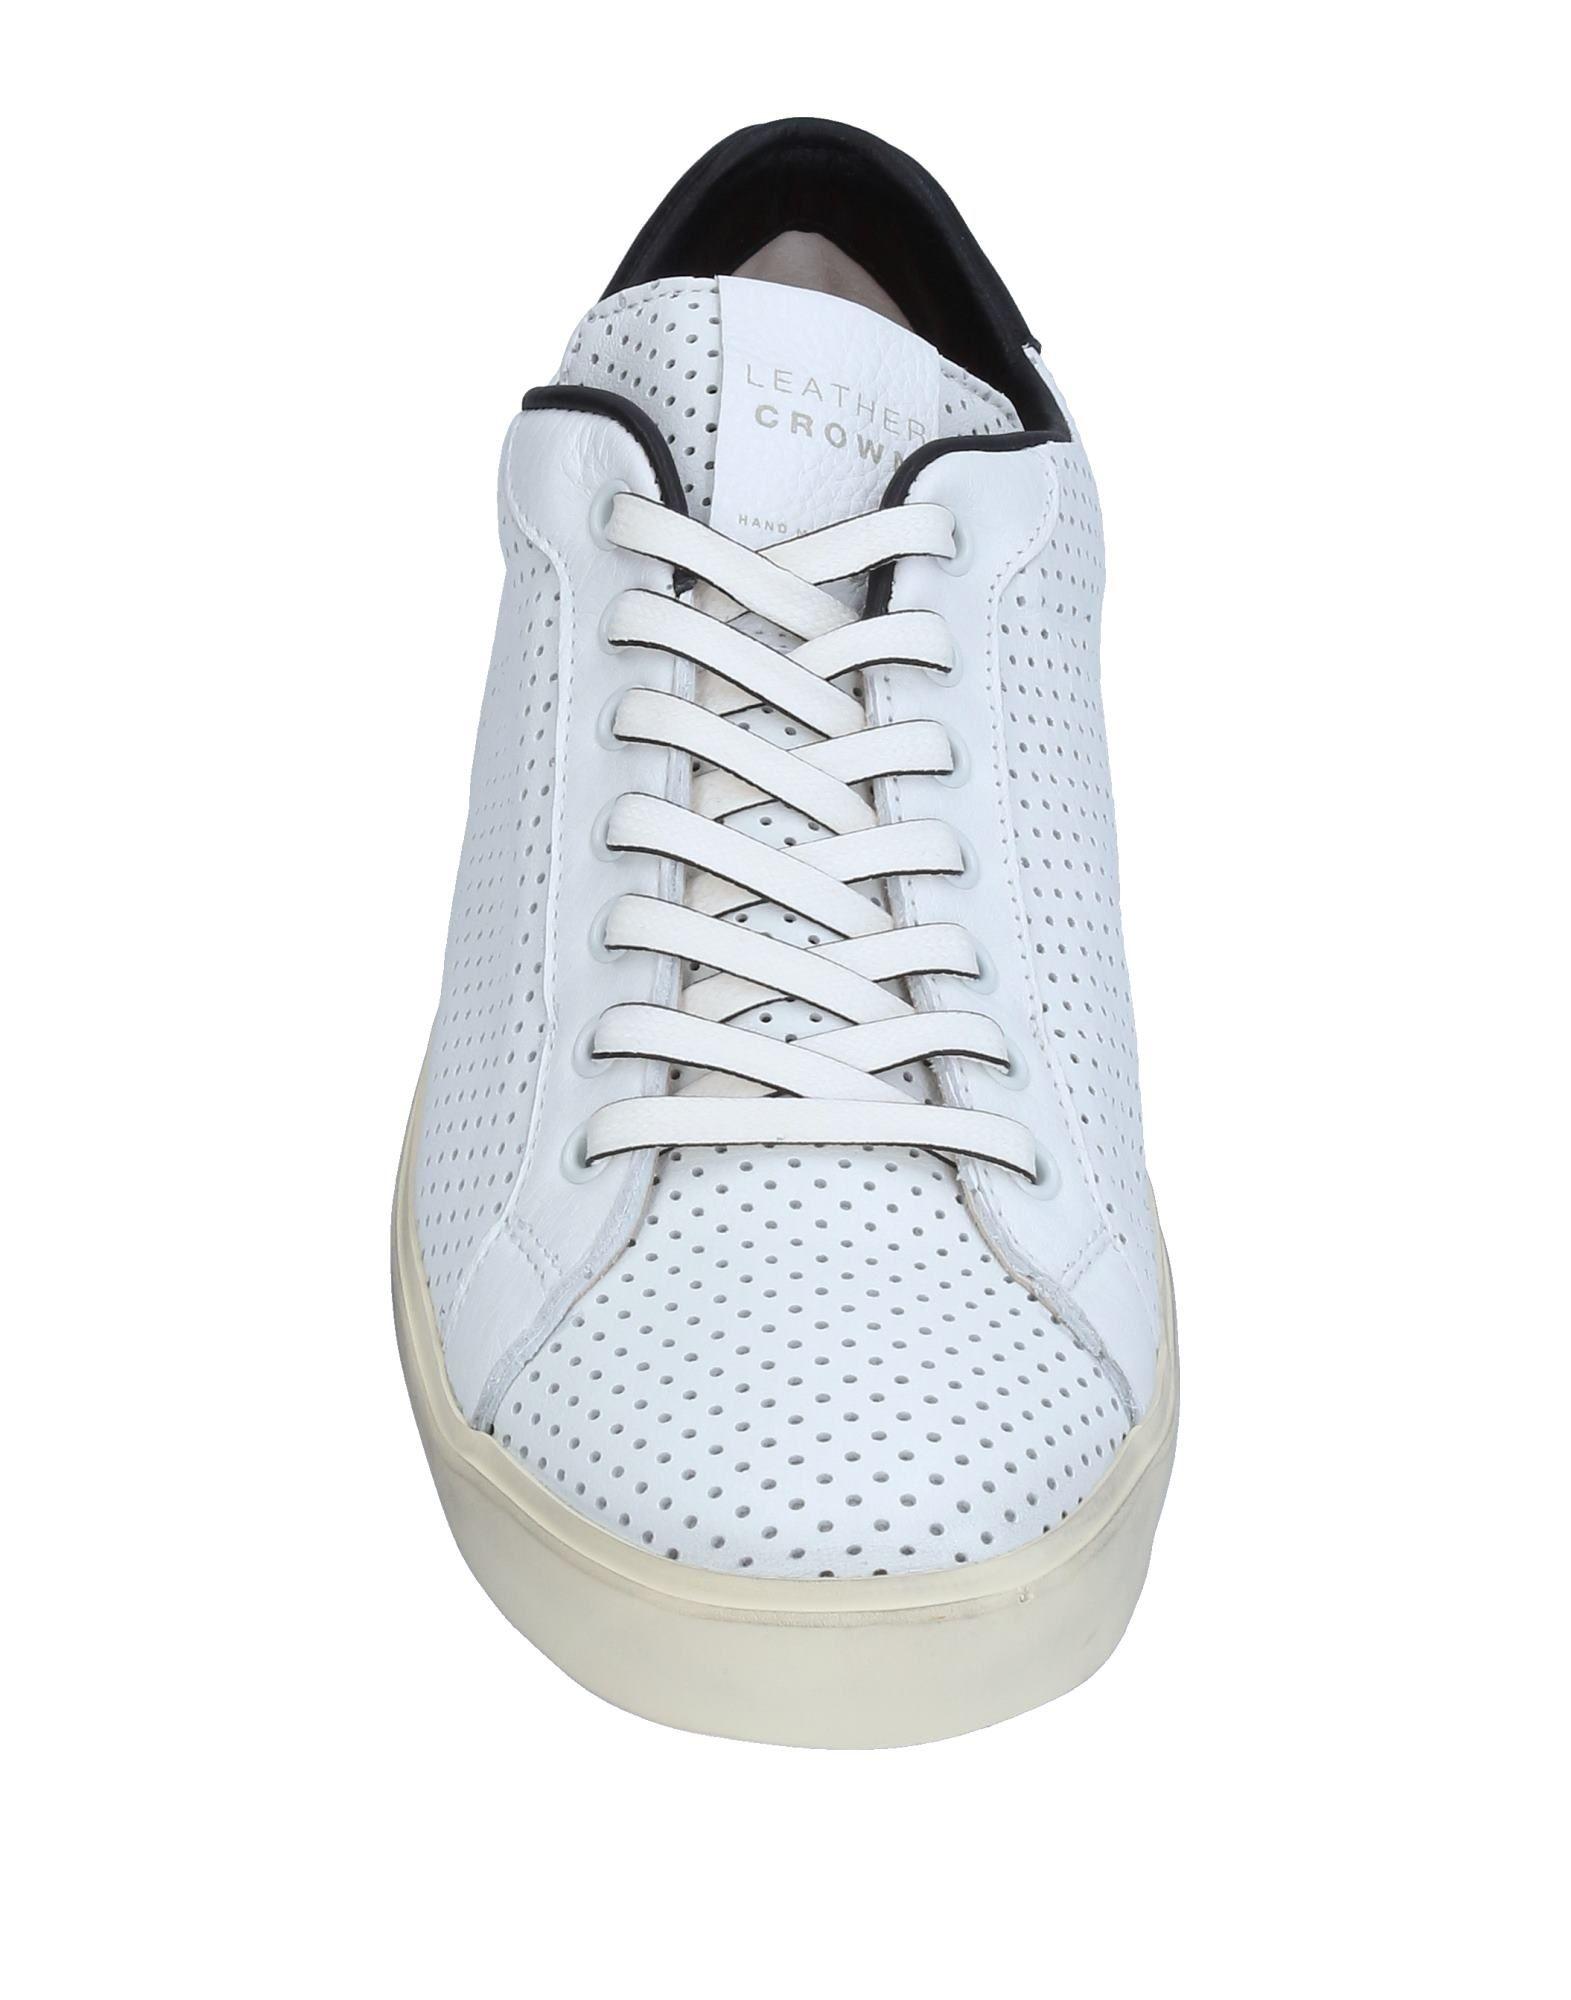 Leather Crown Crown Leather Sneakers Herren  11326620NT 5f5684